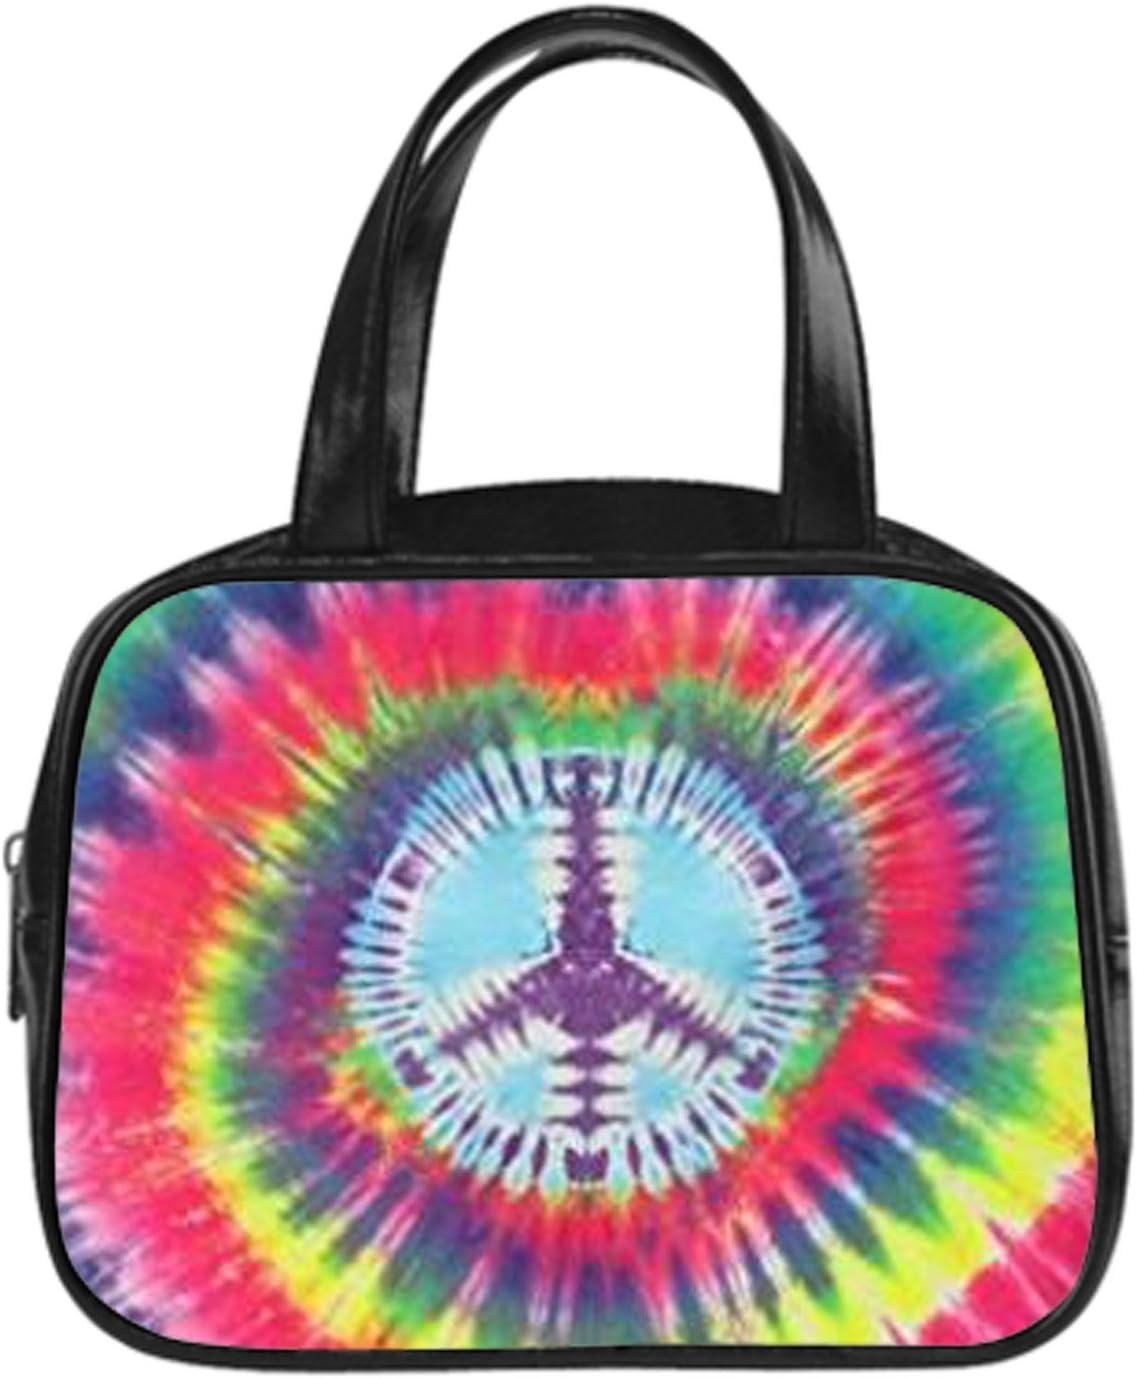 Women Tote Bags Top Handle Satchel Handbags PU Leather Shoulder Purse Peace Sign Tie Dye